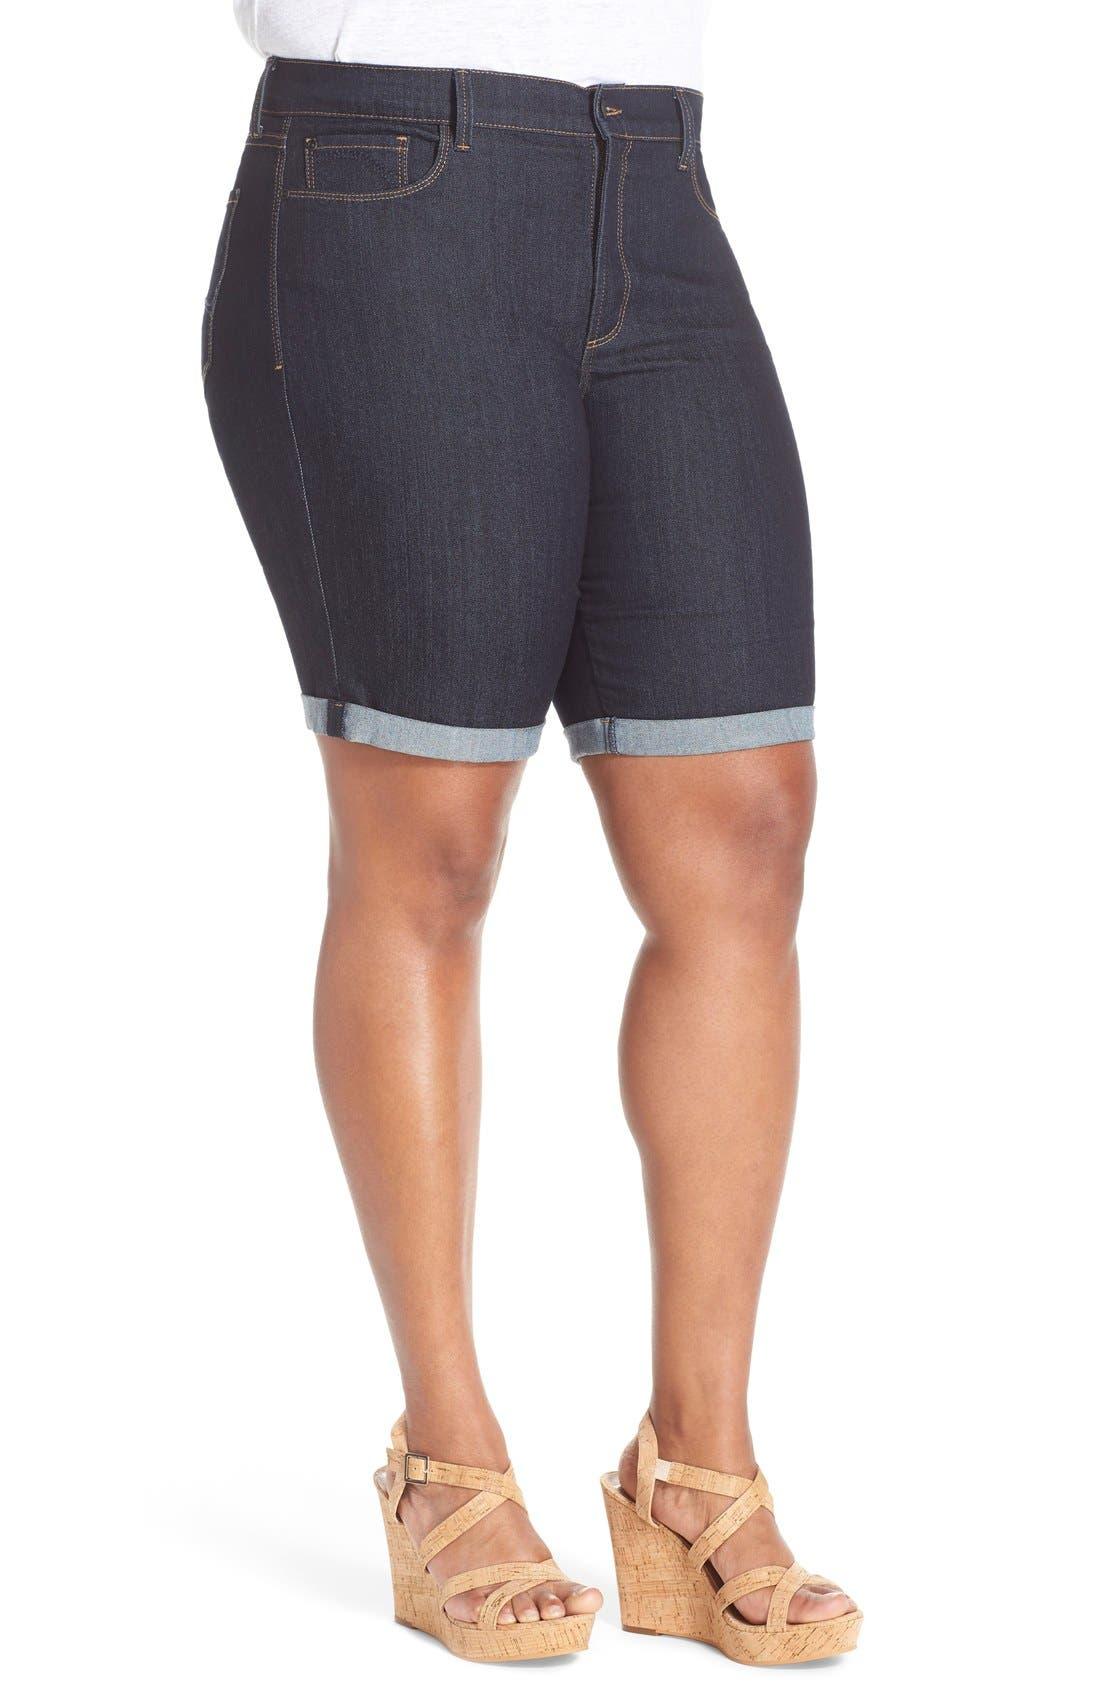 Alternate Image 3  - NYDJ 'Briella' Stretch Roll Cuff Denim Shorts (Dark) (Plus Size)